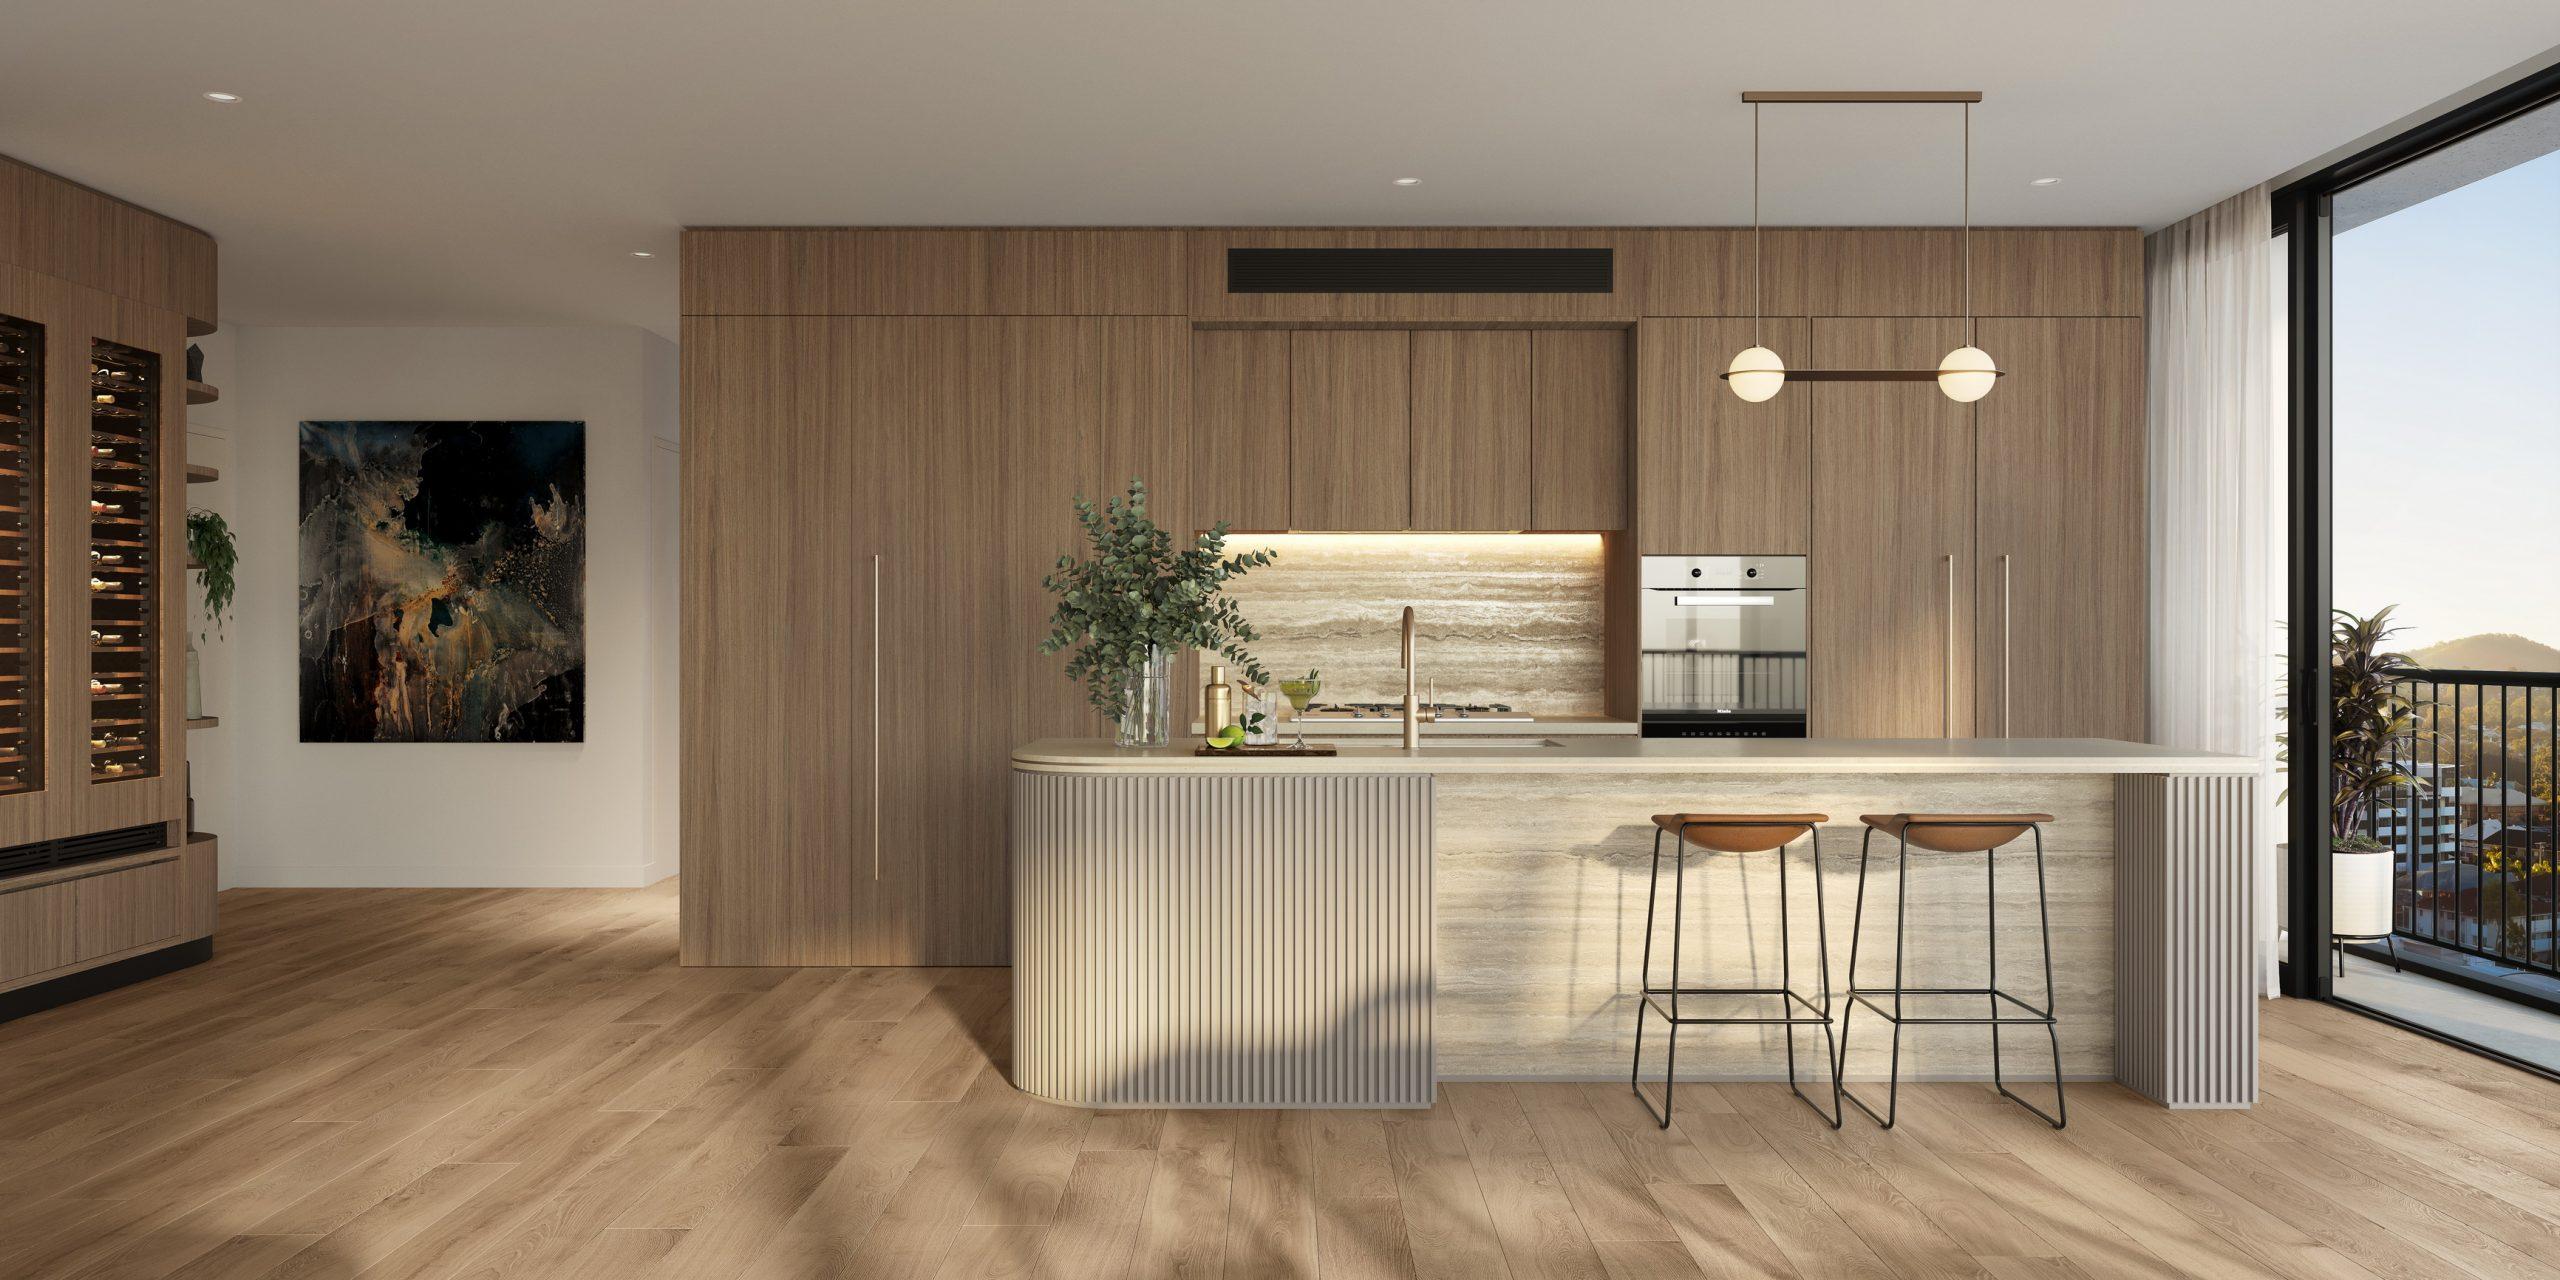 Fkd-studio-the-patterson-toowong-mermaid-beach-mosaic-property-render-3d-interior-render-kitchen